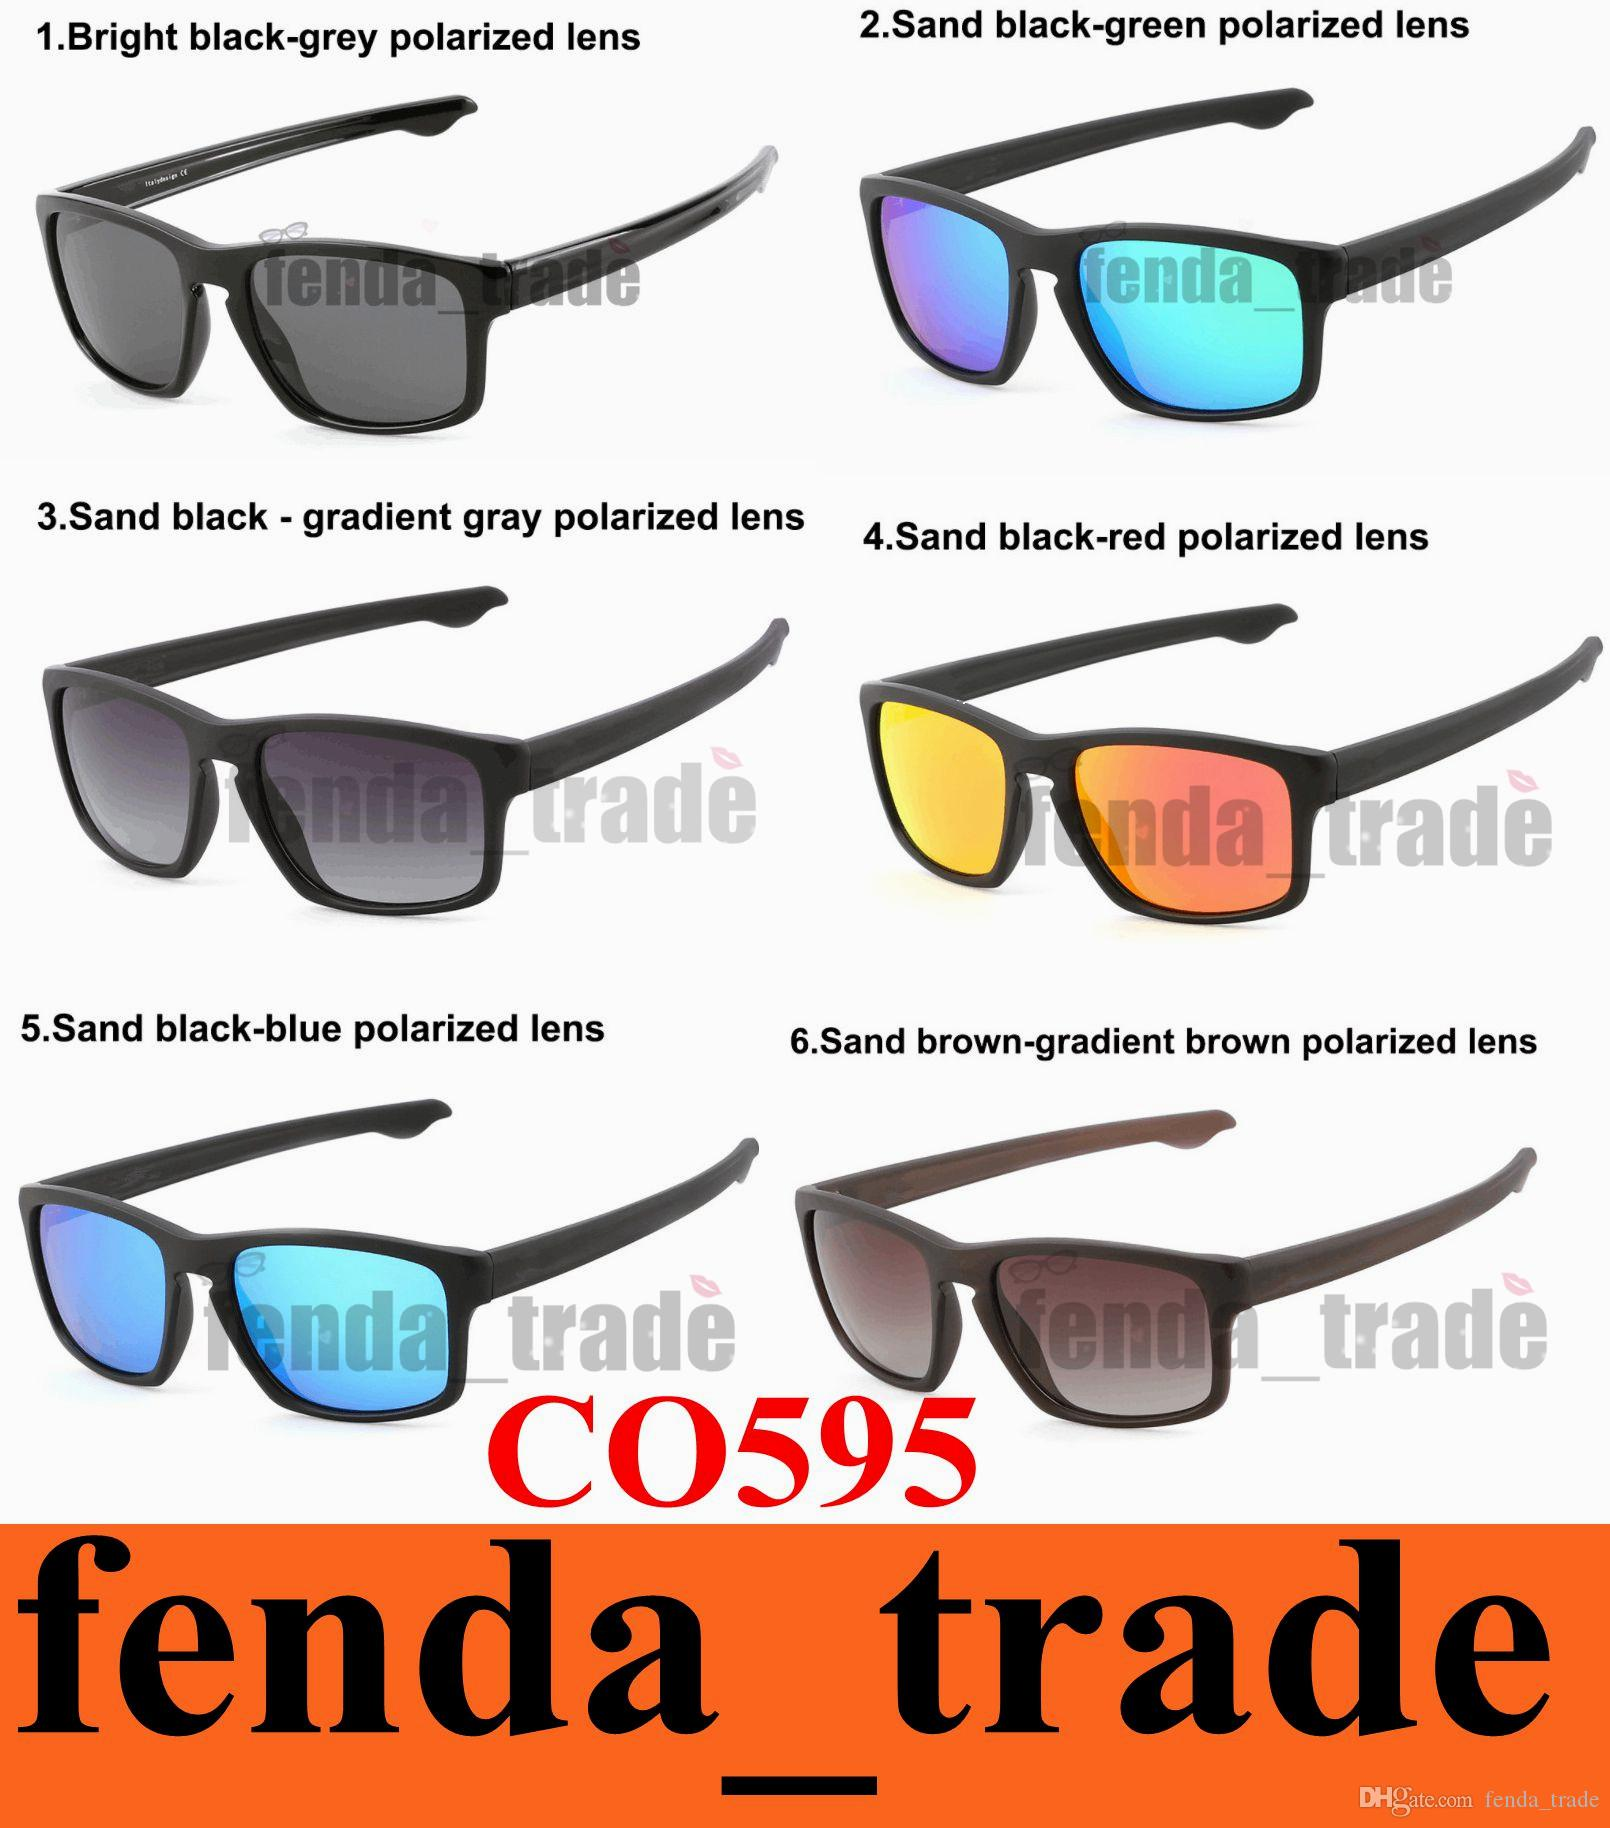 68f7e61acaa 2019 NEWest TR90 Polarized Man Sunglasse Sports Driving Sun Glasses Woman Surfing  Sunglasses Women HOT Sunglasses Brand Designer 2019 New Sunglasses ...